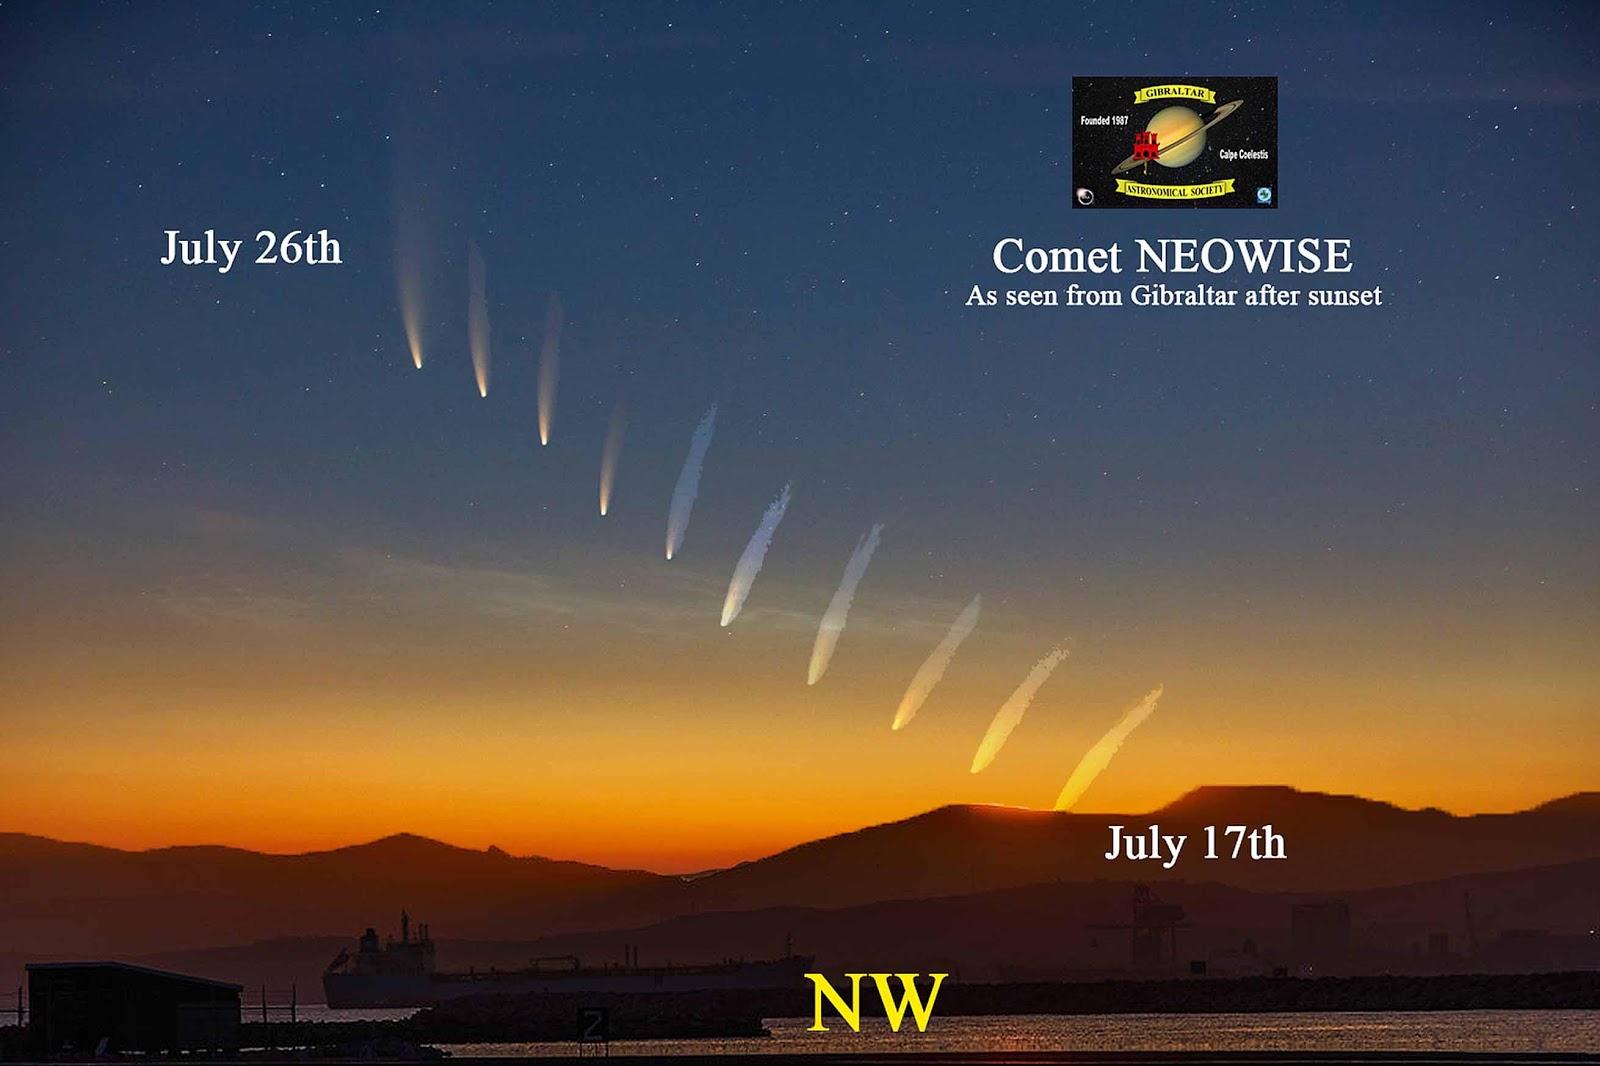 (PHOTOS) Comet Neowise Seen Over Humboldt County; Heres